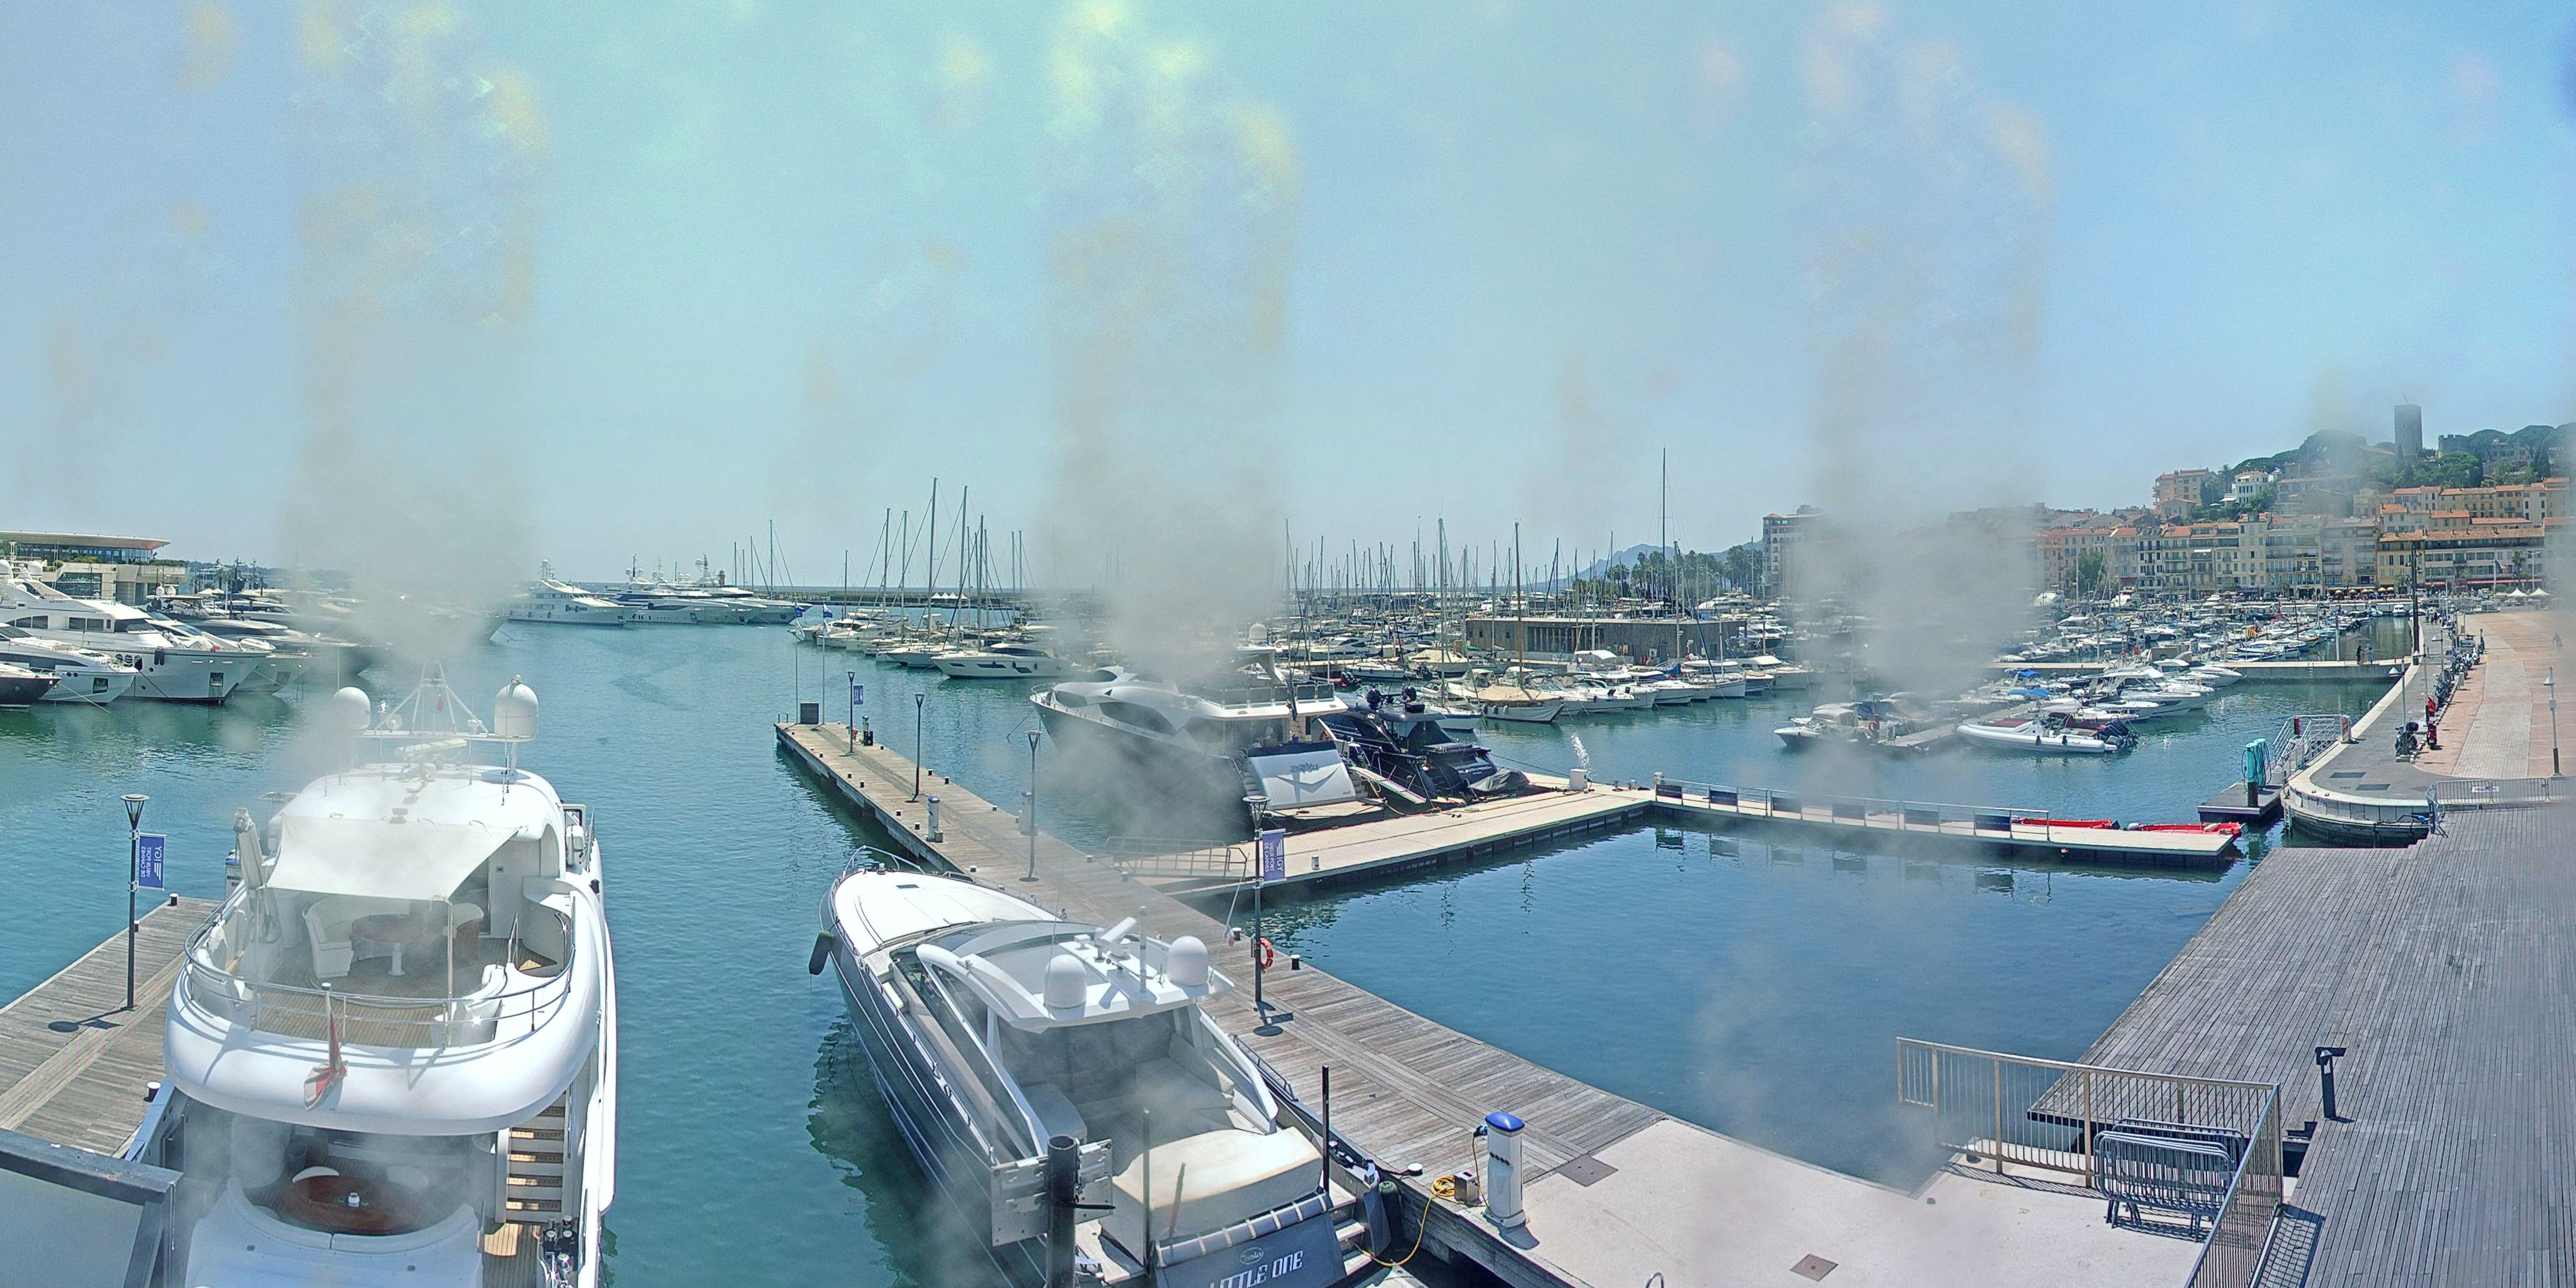 Cannes Thu. 15:35